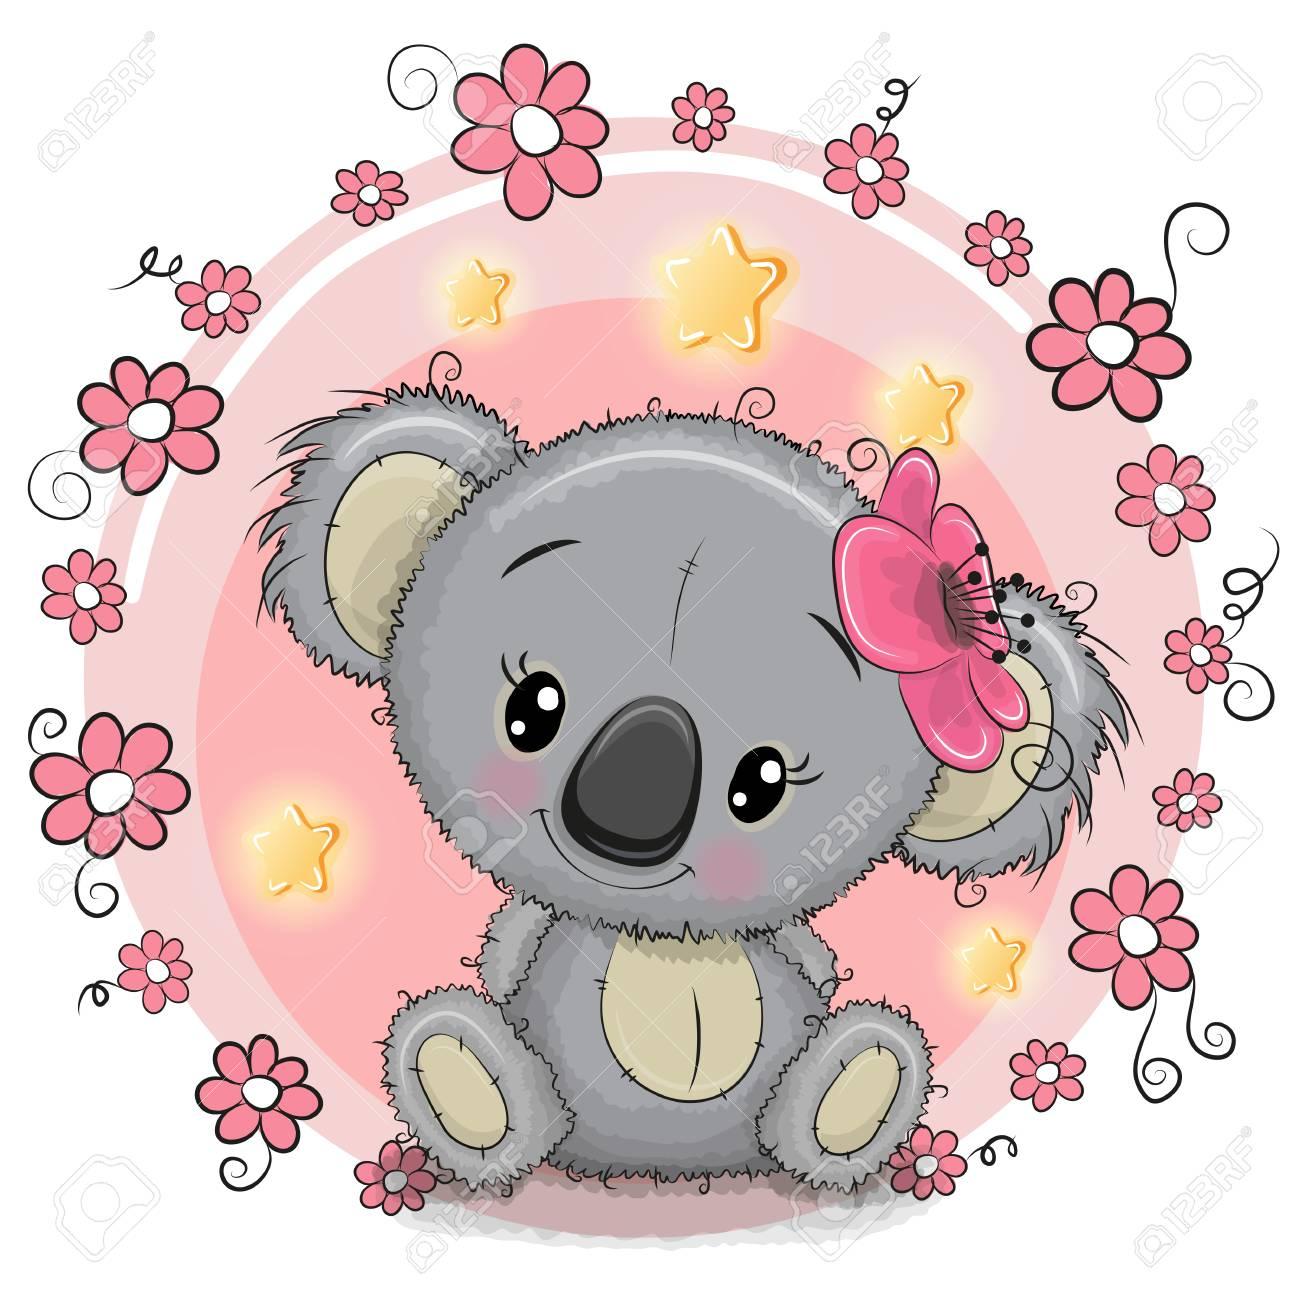 Greeting card cute cartoon koala with flowers royalty free cliparts greeting card cute cartoon koala with flowers stock vector 88069508 m4hsunfo